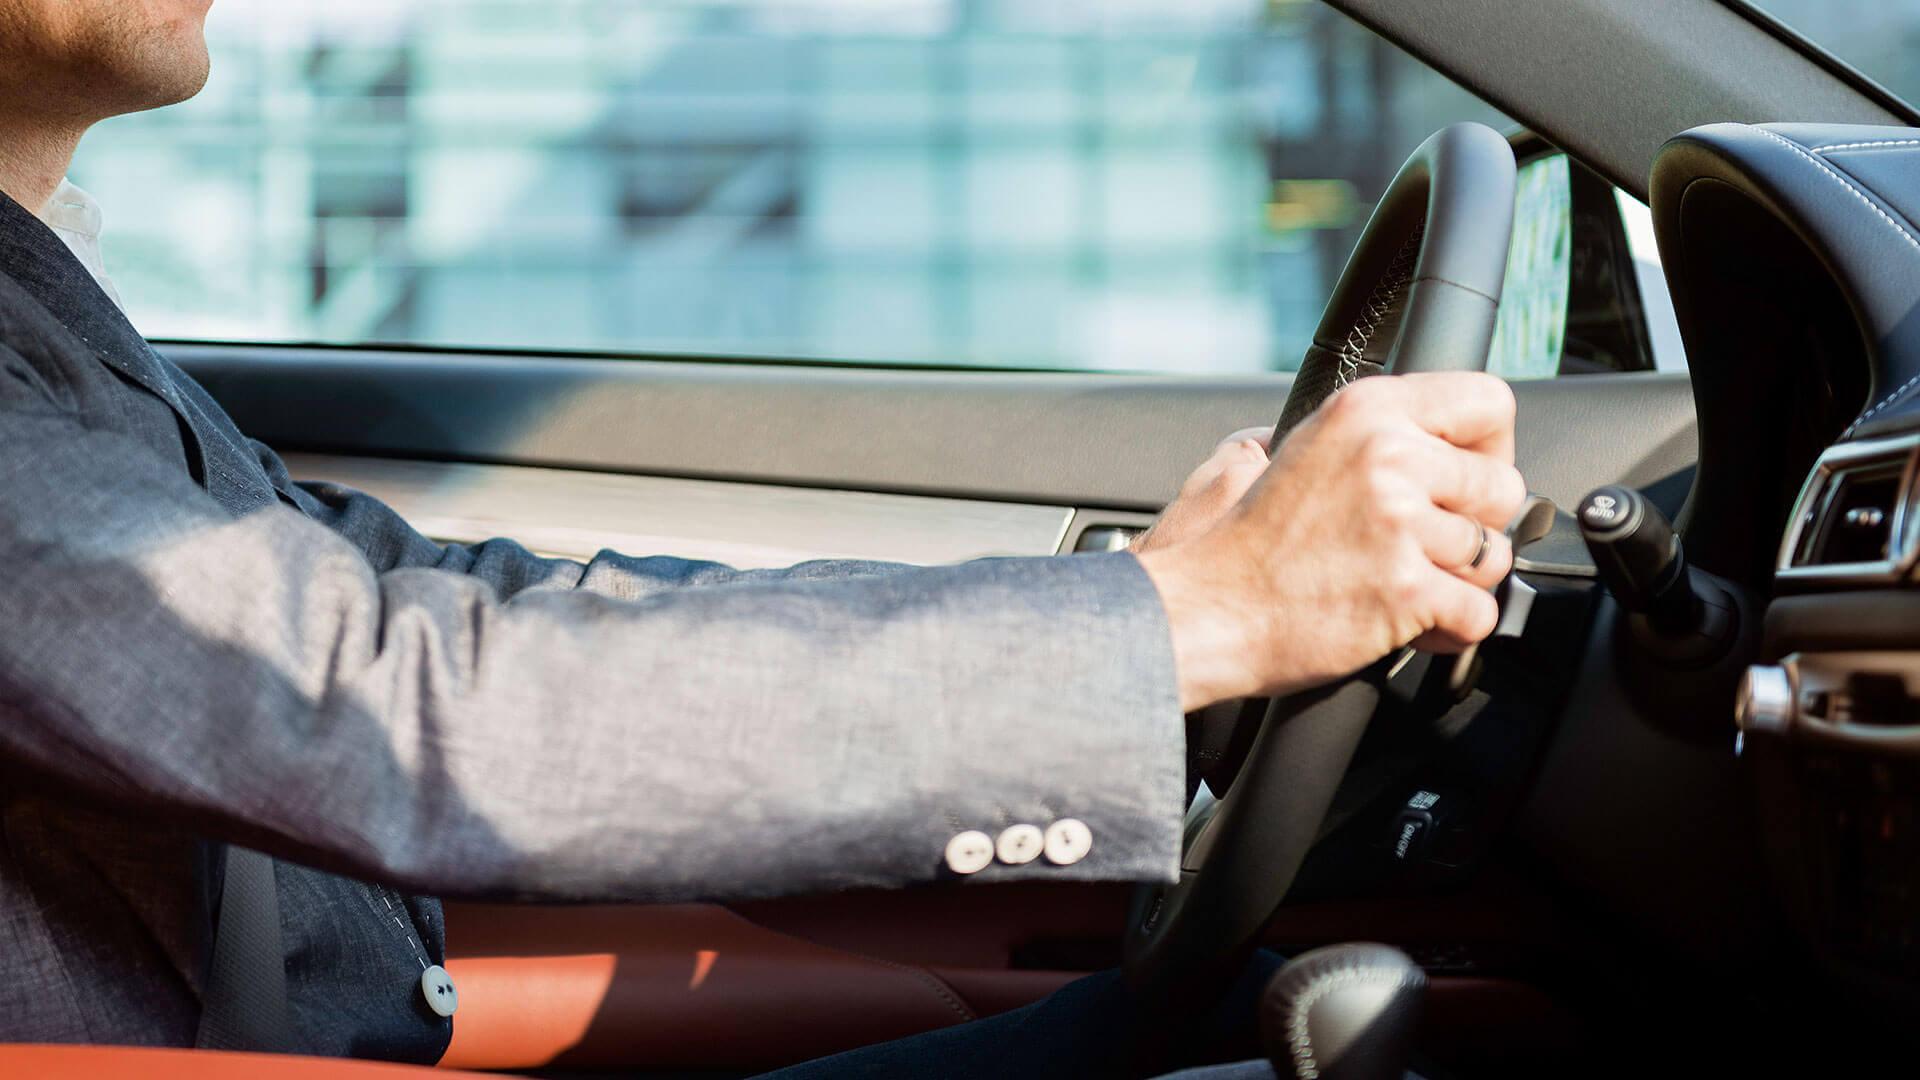 2017 lexus ct 200h next steps behind wheel